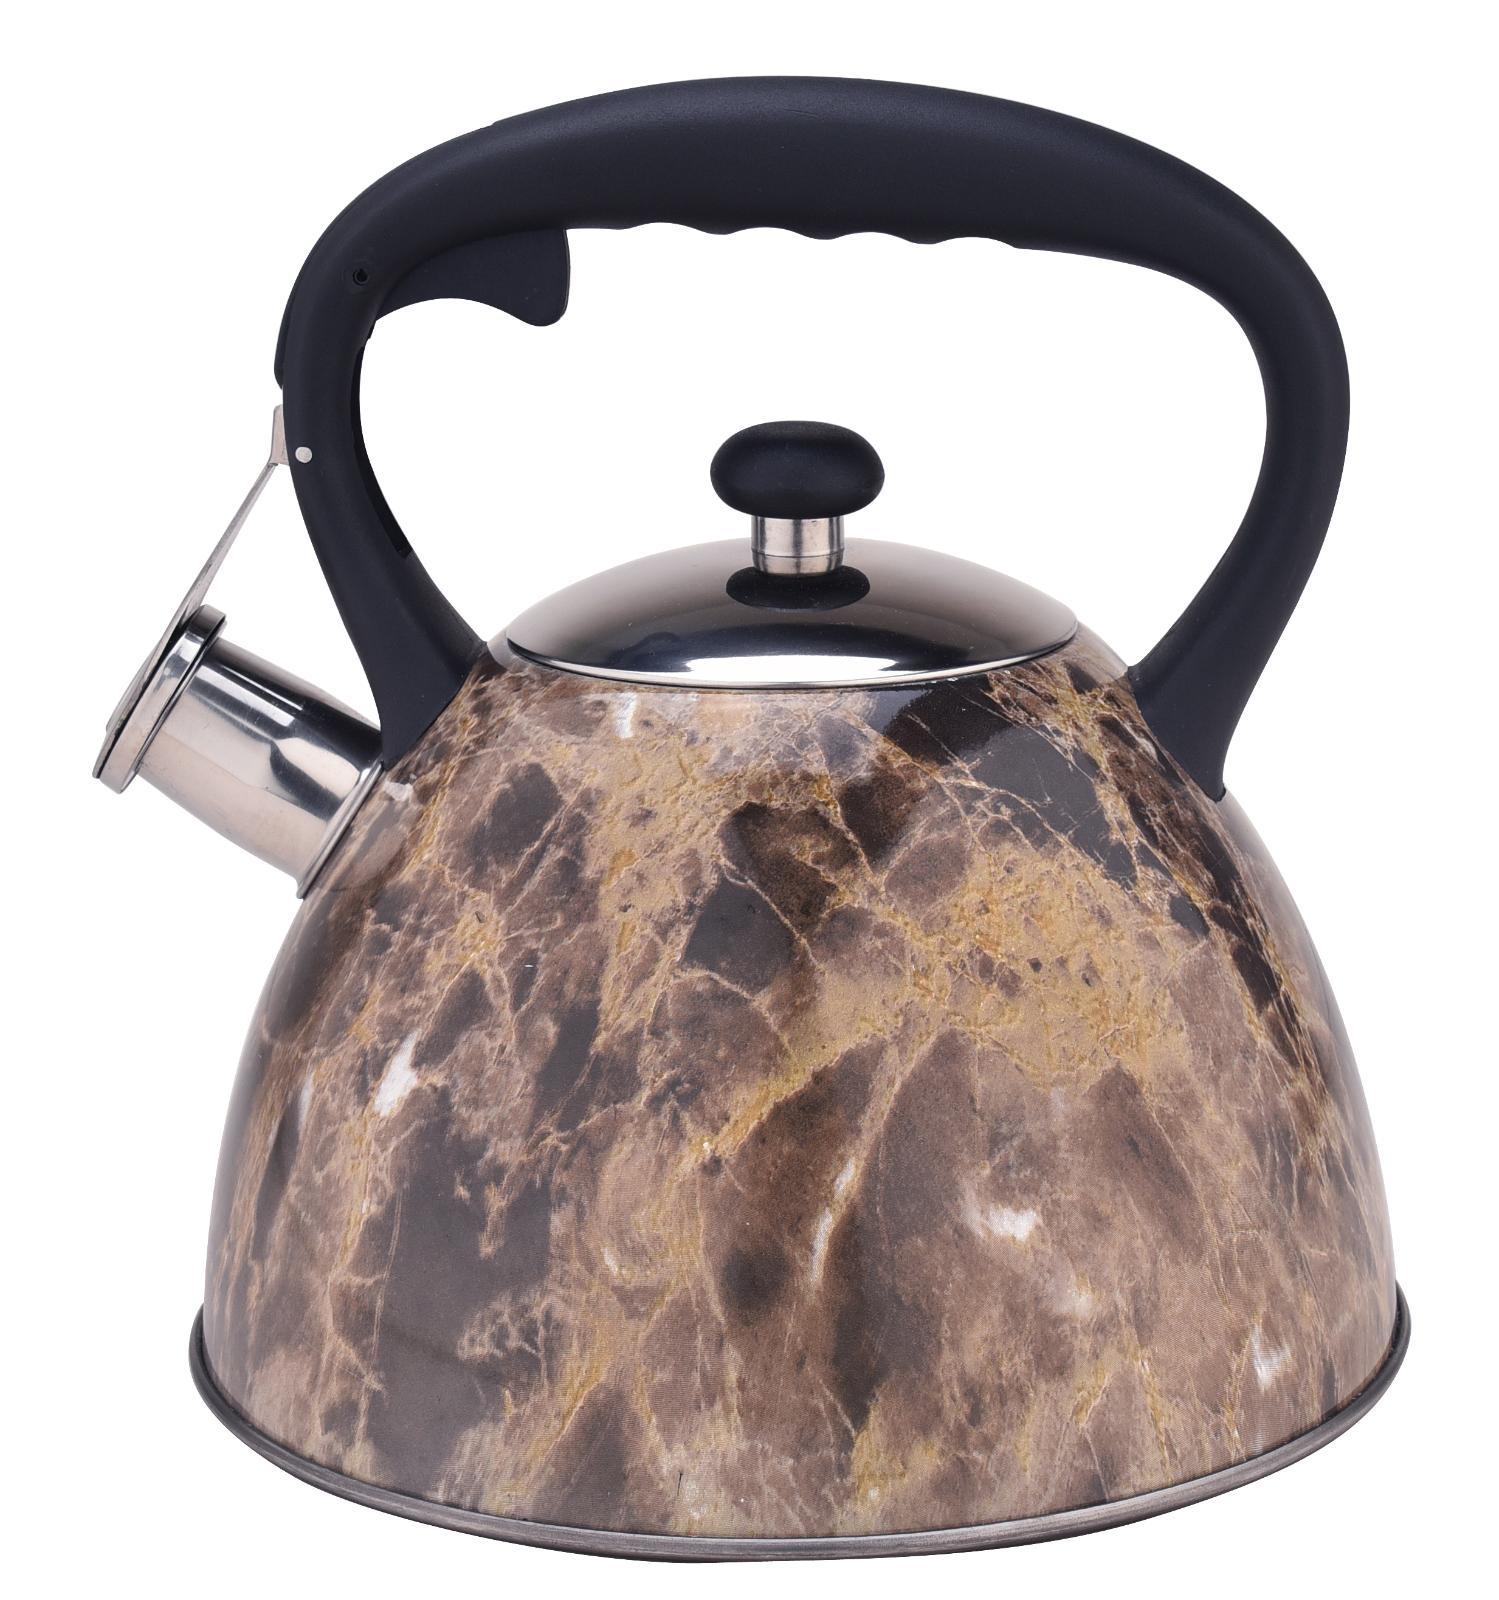 Stovetop Teapot Whistling Tea Kettle Water Kettle Teakettle